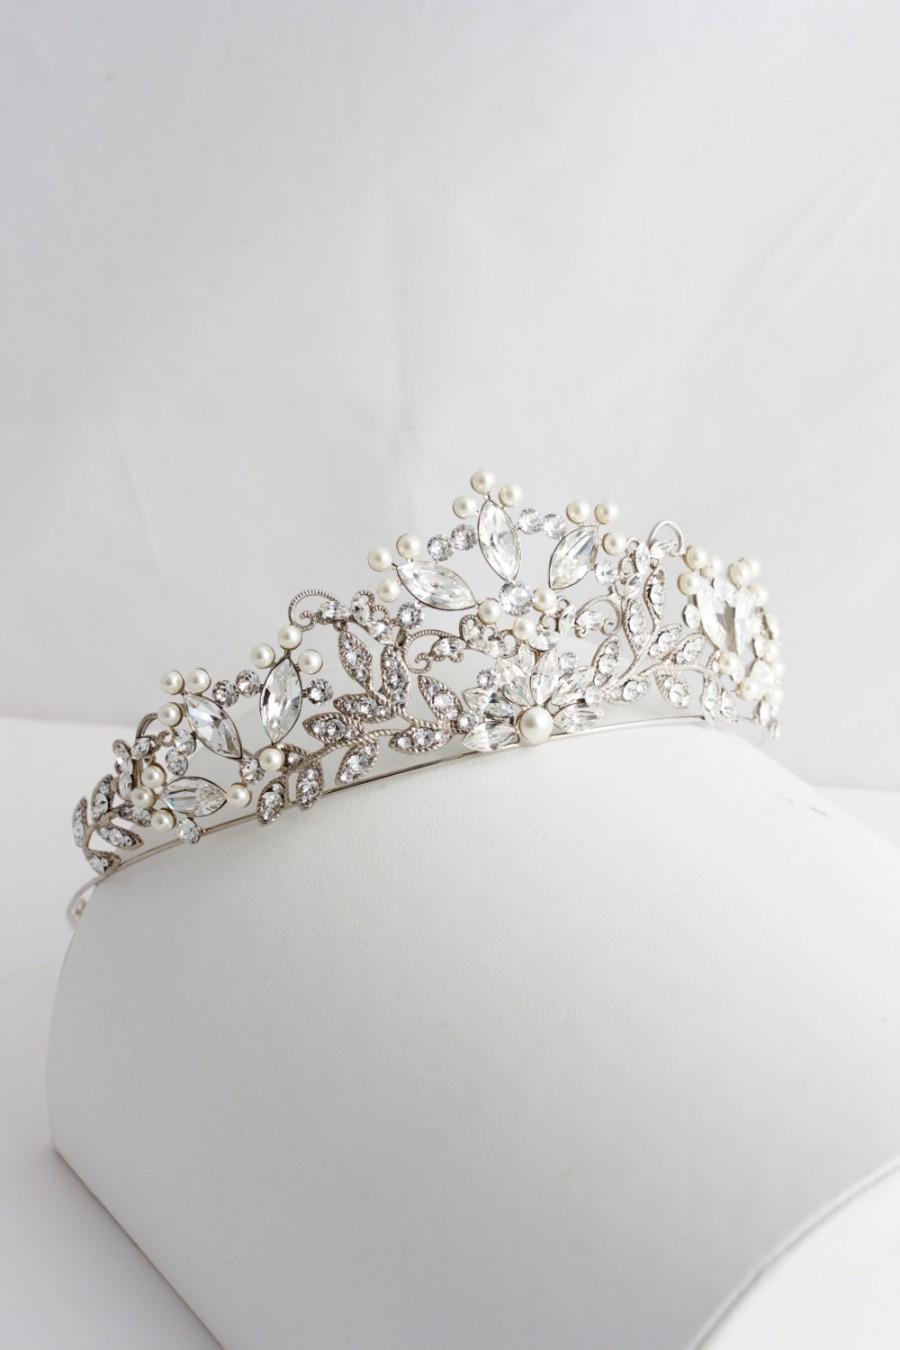 Wedding - Wedding Tiara Handmade Bridal Crown Pearl Crystal Wedding Tiara Swarovski Crystal Crown Tiara  Wedding Bridal Tiara Rose Gold Tiara AISLINN